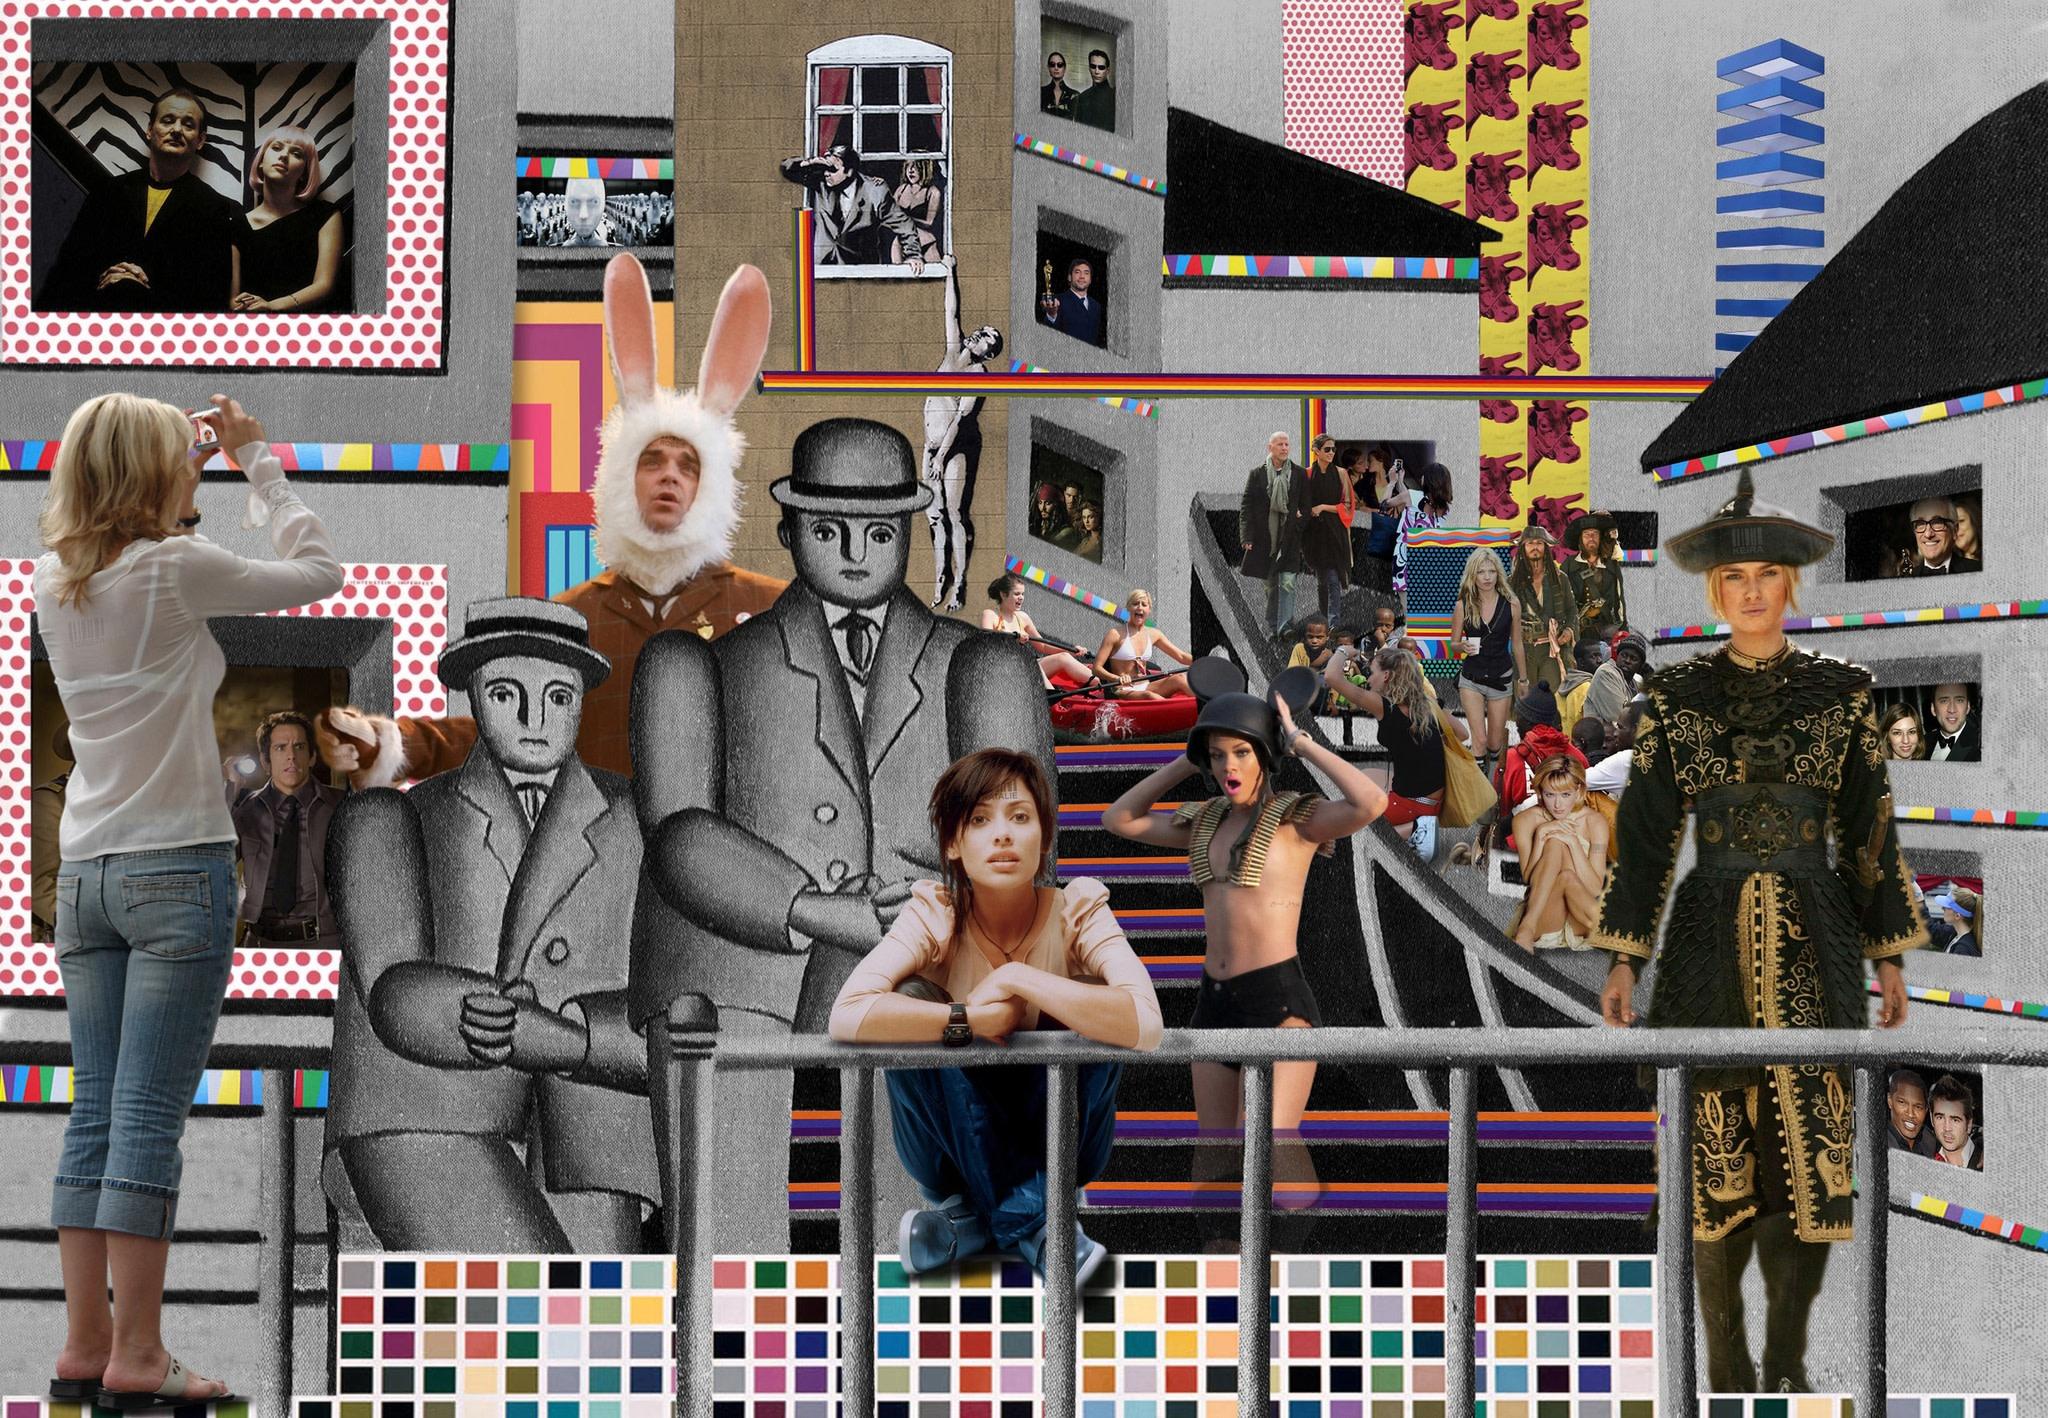 "<span class=""link fancybox-details-link""><a href=""/exhibitions/120/works/artworks607/"">View Detail Page</a></span><div class=""artist""><strong>Lluís Barba</strong></div><div class=""title""><em>Animated Landscape, Fernand Léger</em>, 2010</div><div class=""medium"">C-Type Print, Diasec Mounted<br> </div><div class=""dimensions"">50 x 70 cm<br>19 3/4 x 27 1/2 in.</div><div class=""edition_details"">Edition of 6 plus 2 artist's proofs</div>"